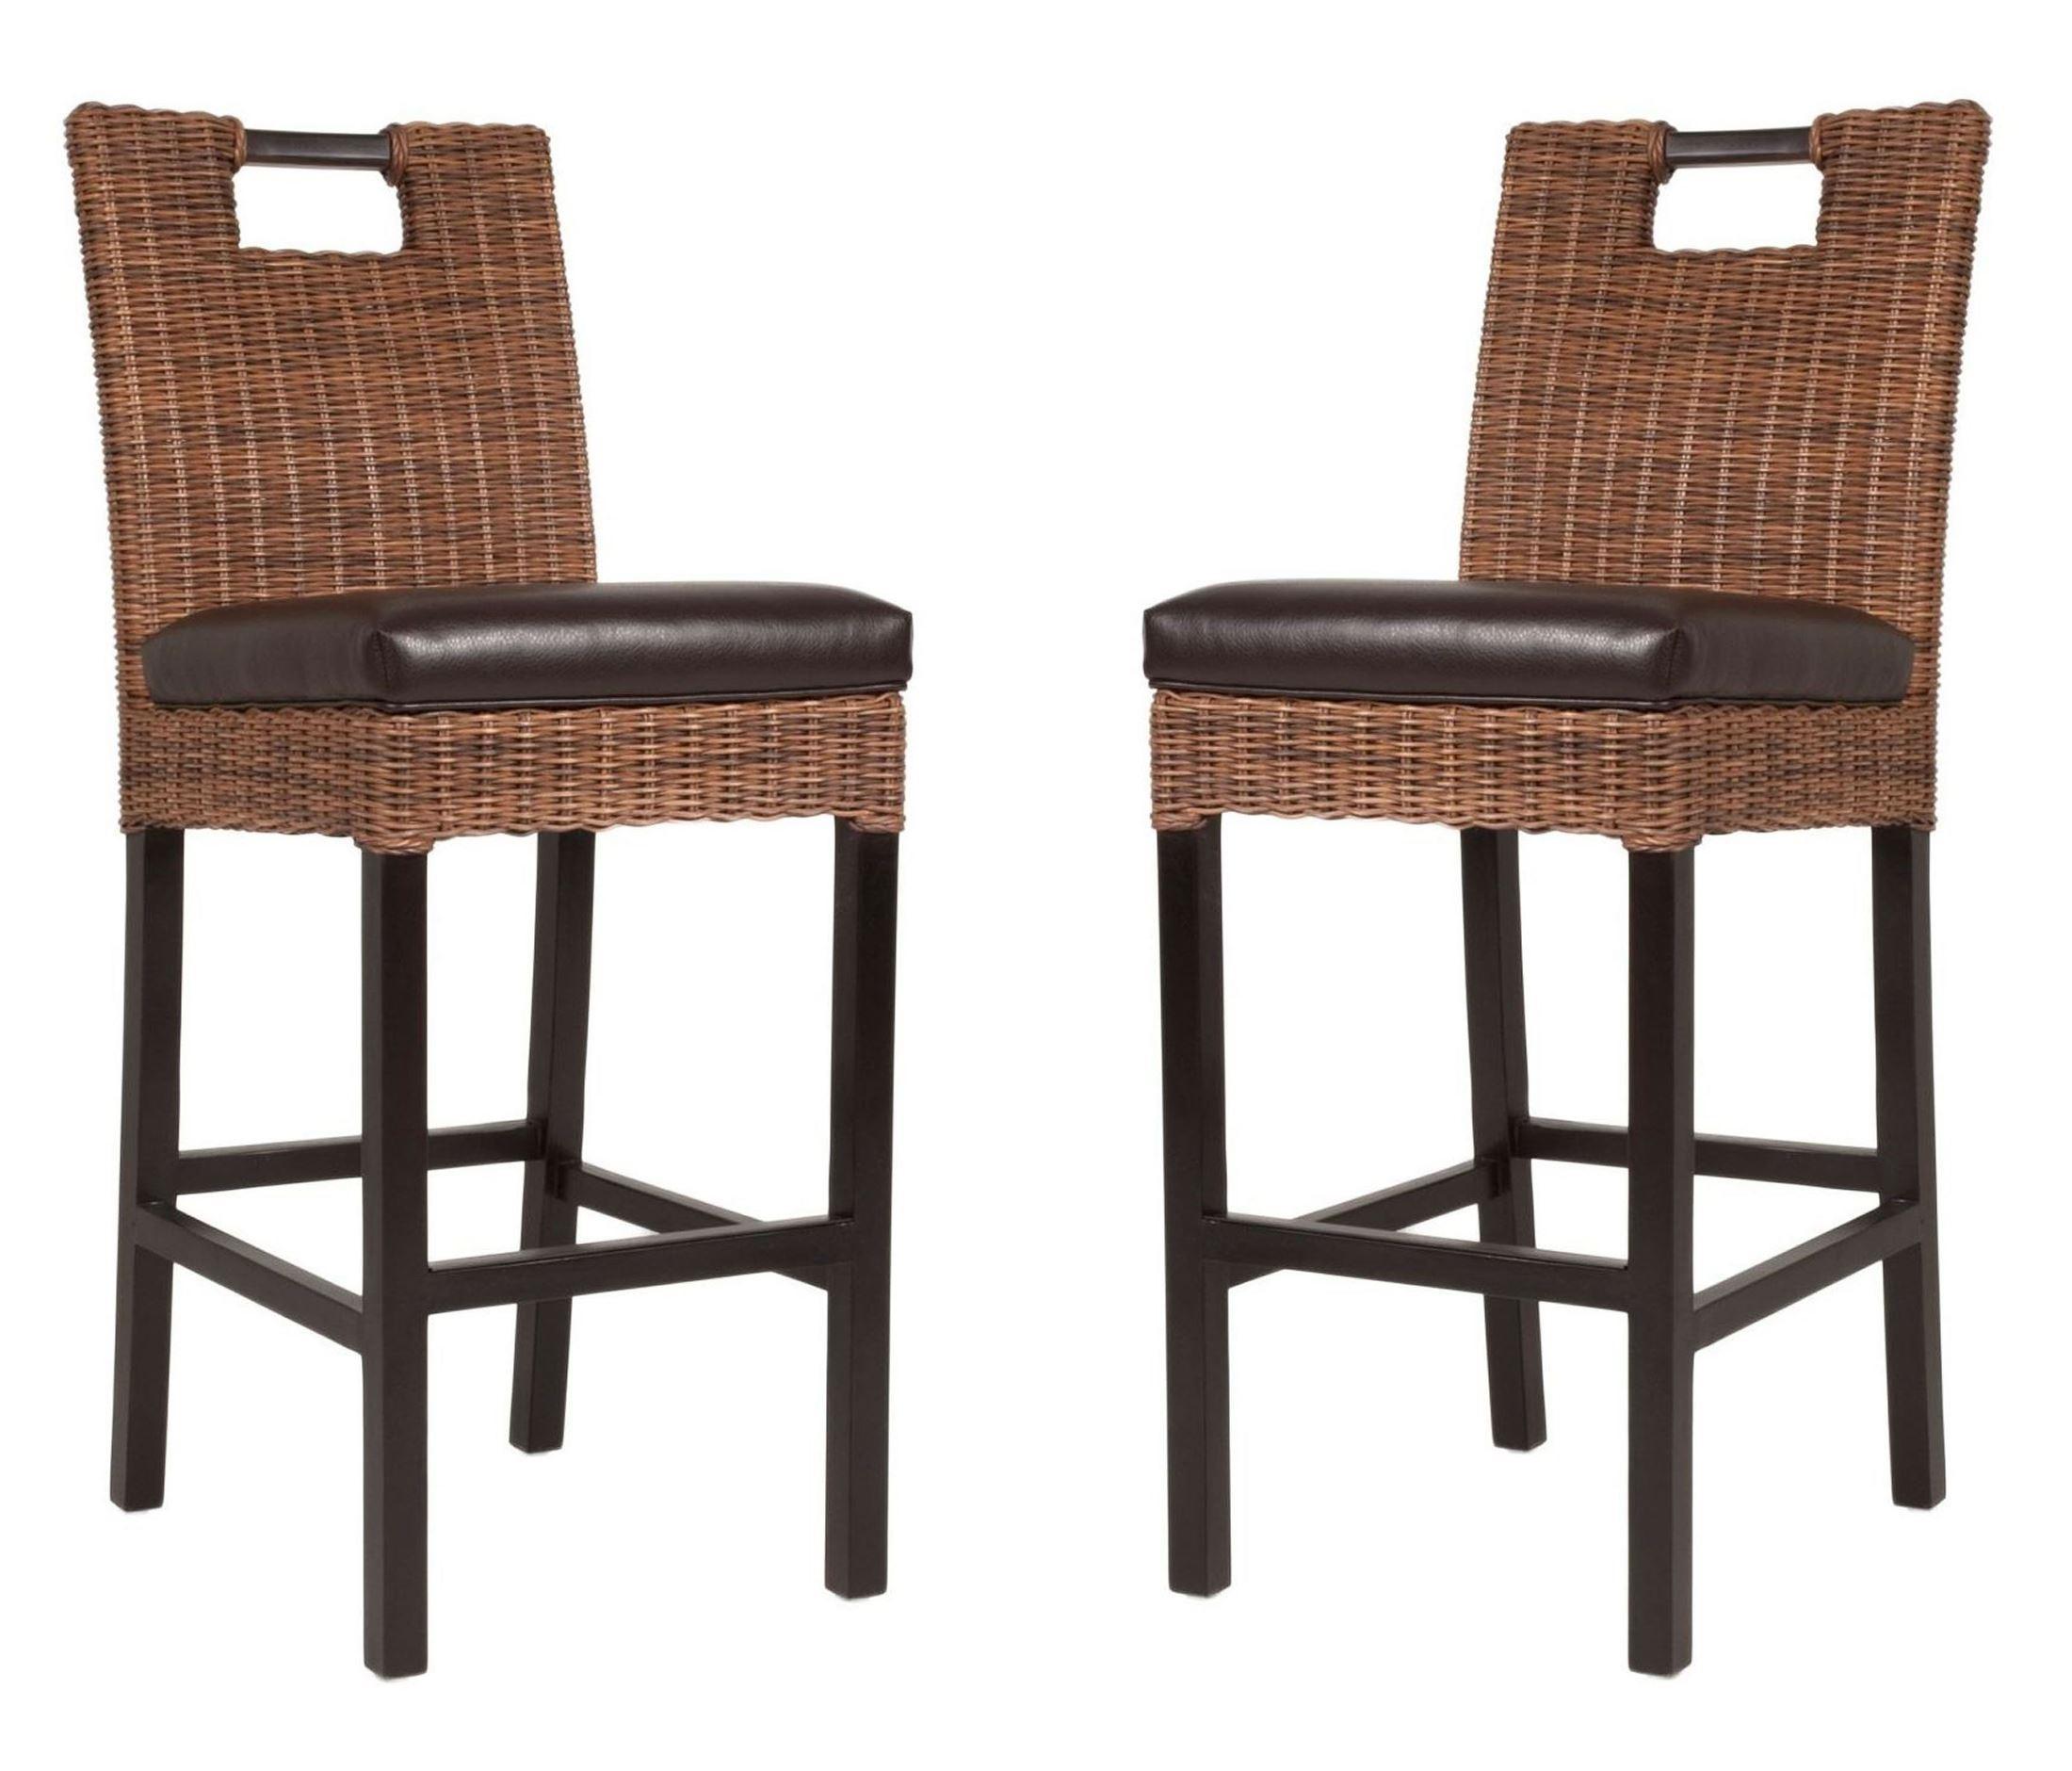 Boston Havana Bonded Leather Barstool Set Of 2 6846 Hav